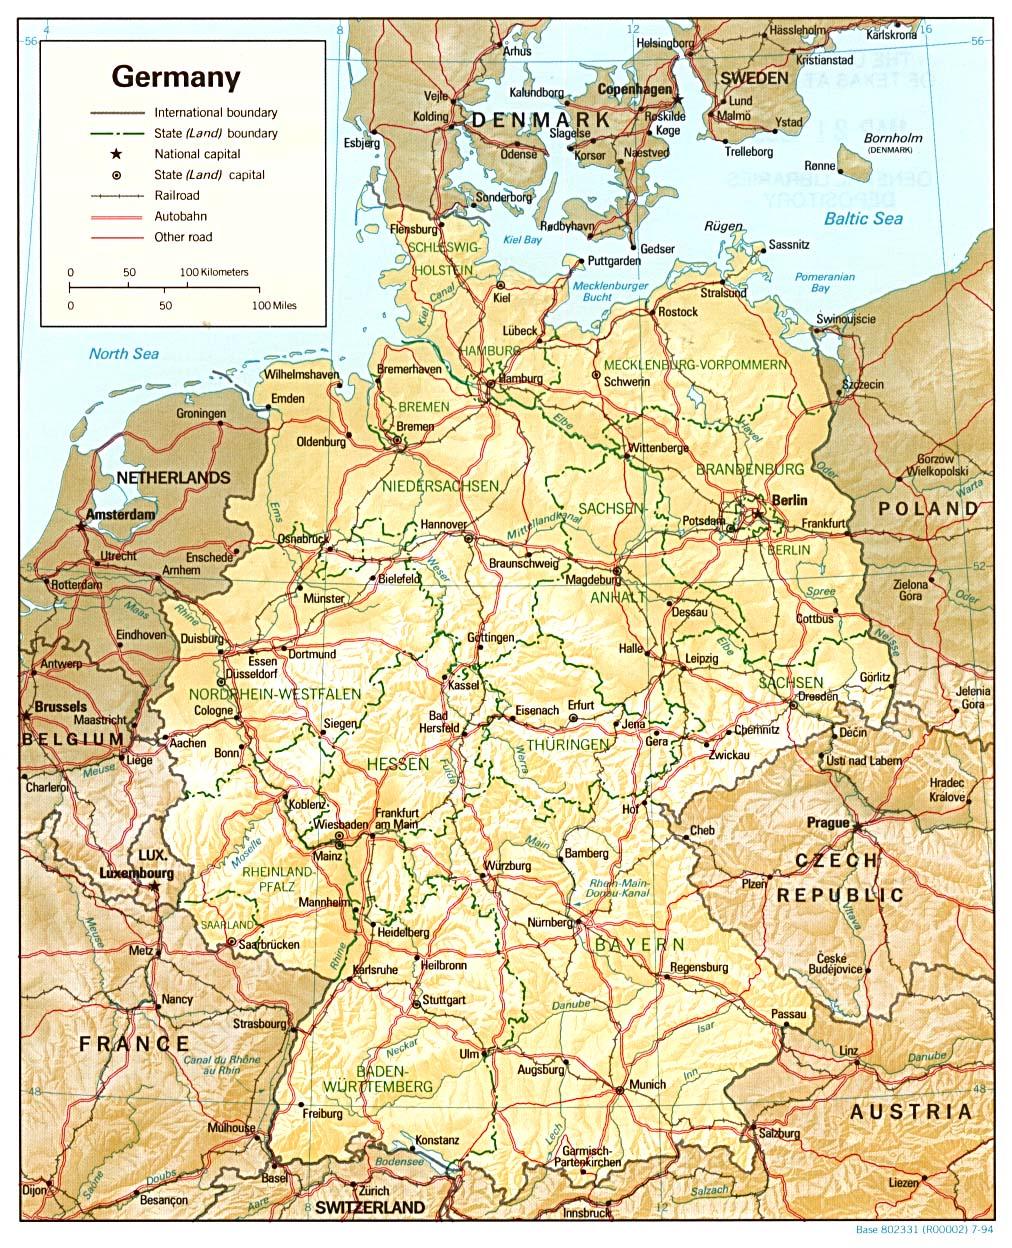 Landkarte Deutschland Deutschlandkarte Deutschland Landkarte